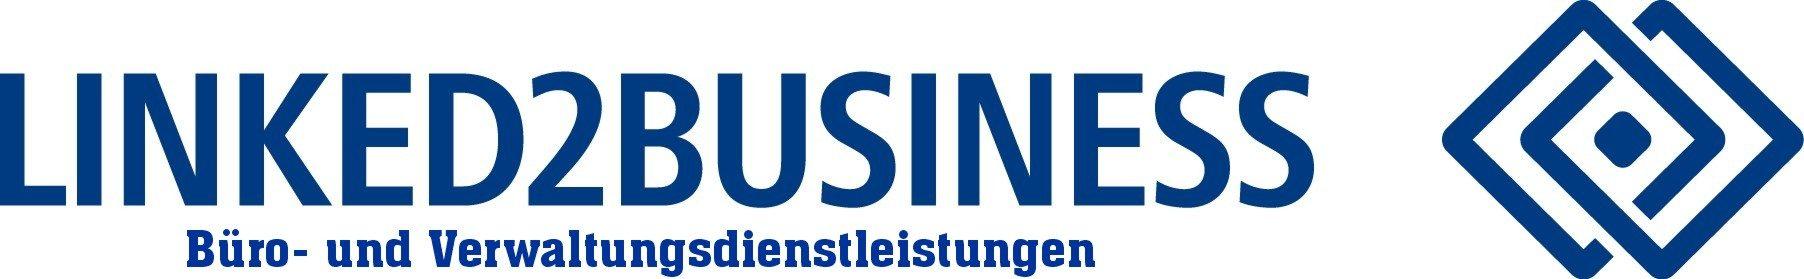 Linked2Business Matthias Apel